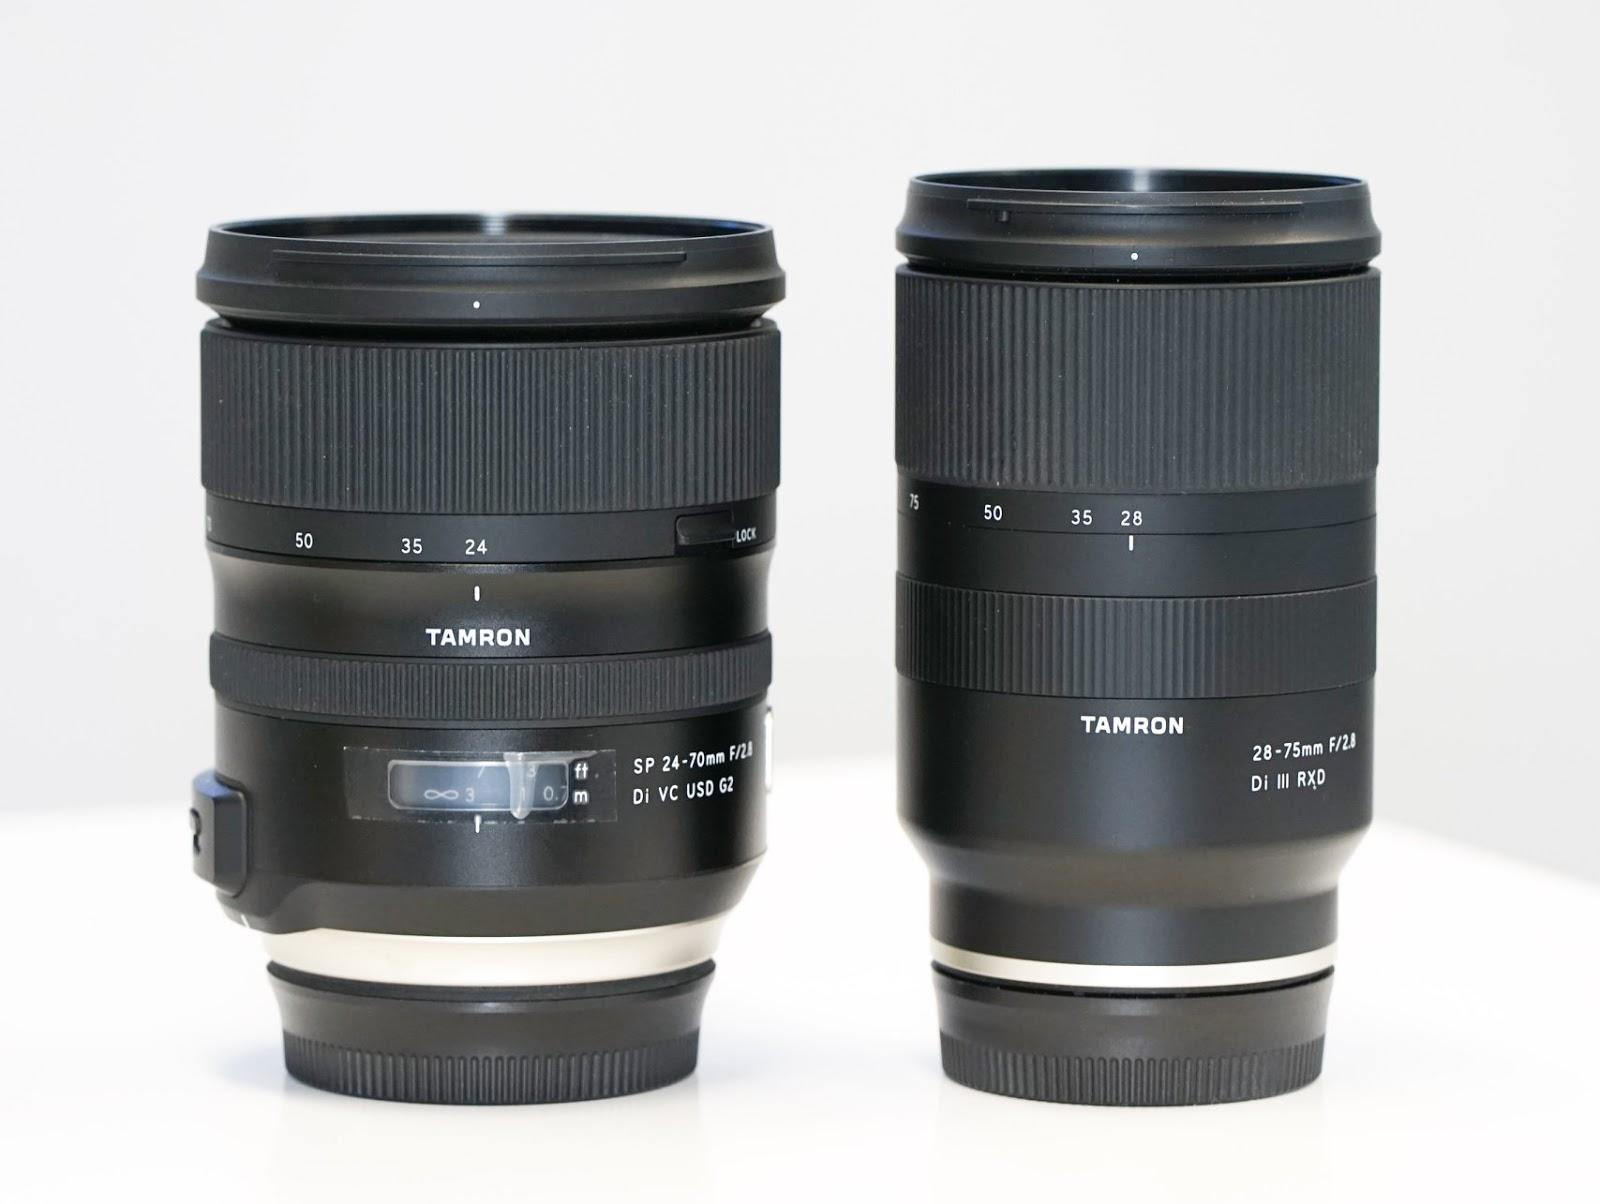 Сравнение габаритов Tamron SP 24-70mm f/2.8 Di VC USD G2 (слева) и Tamron 28-75mm f/2.8 Di III RXD (справа)